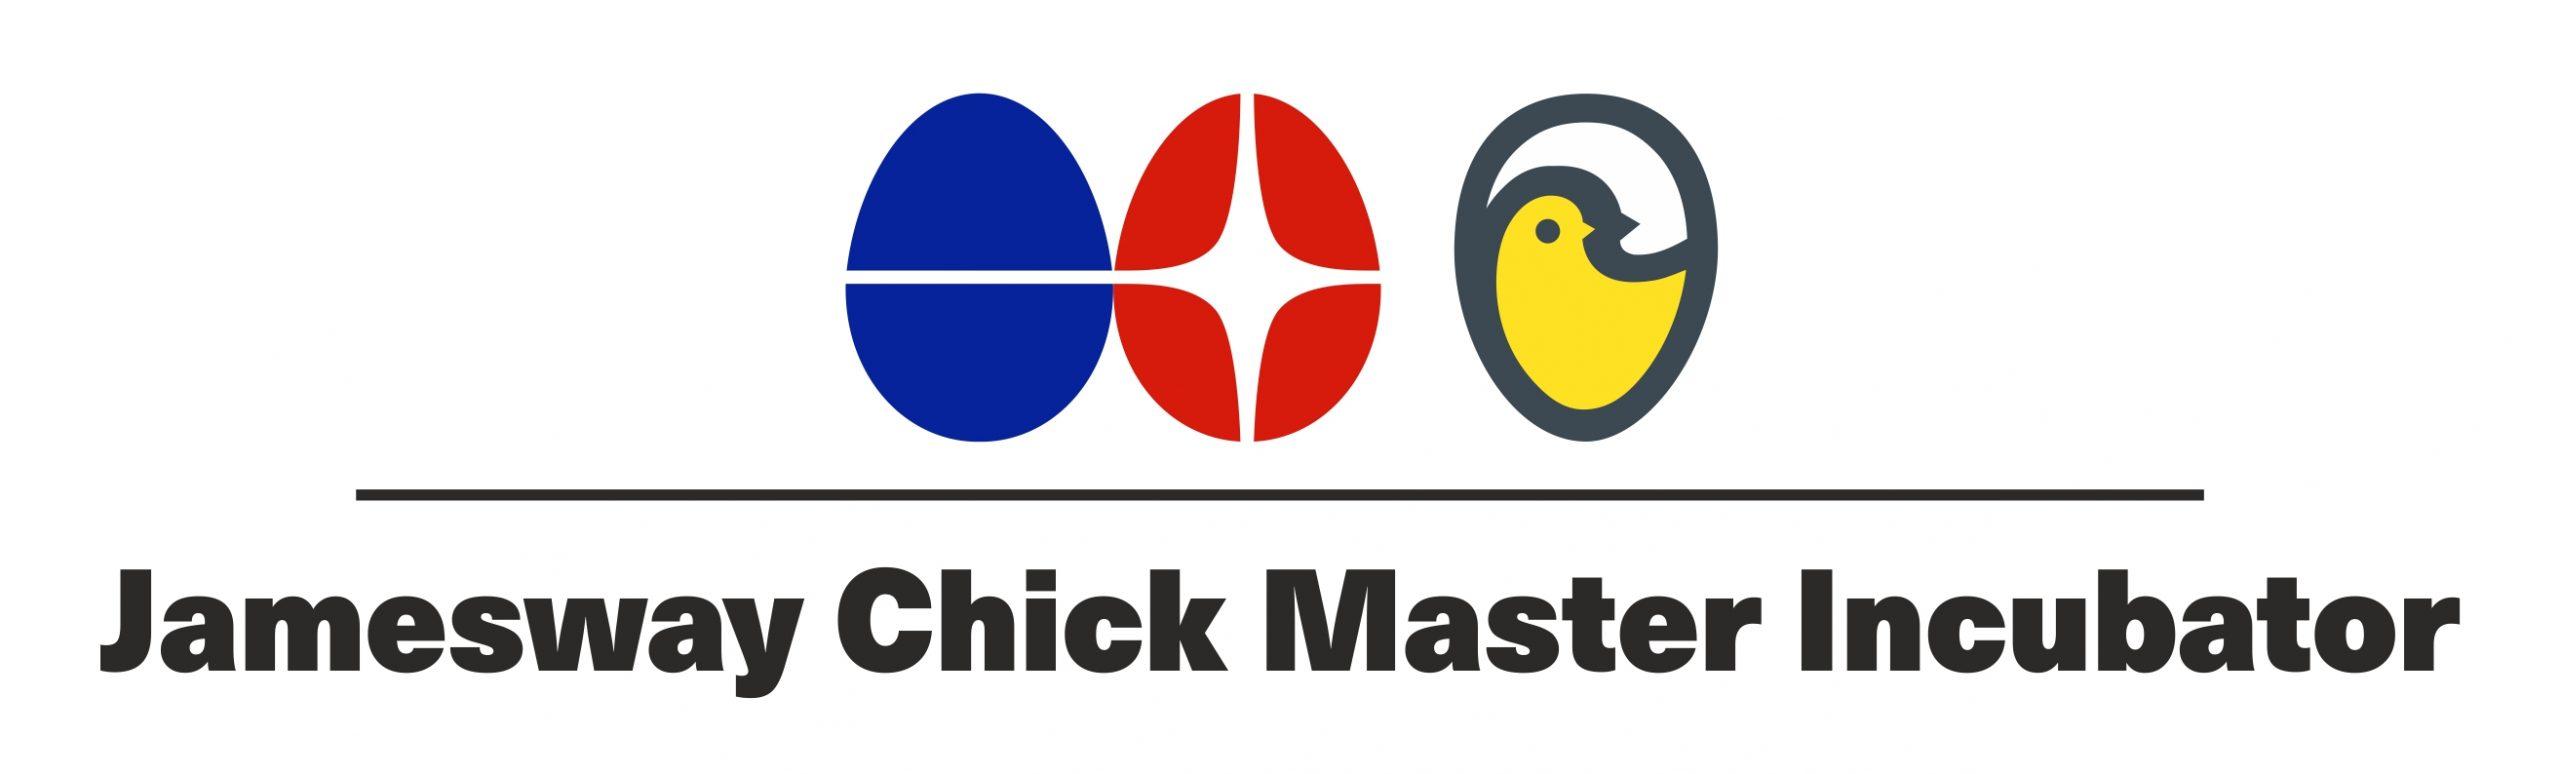 Logo Jamesway Chick Master Incubator